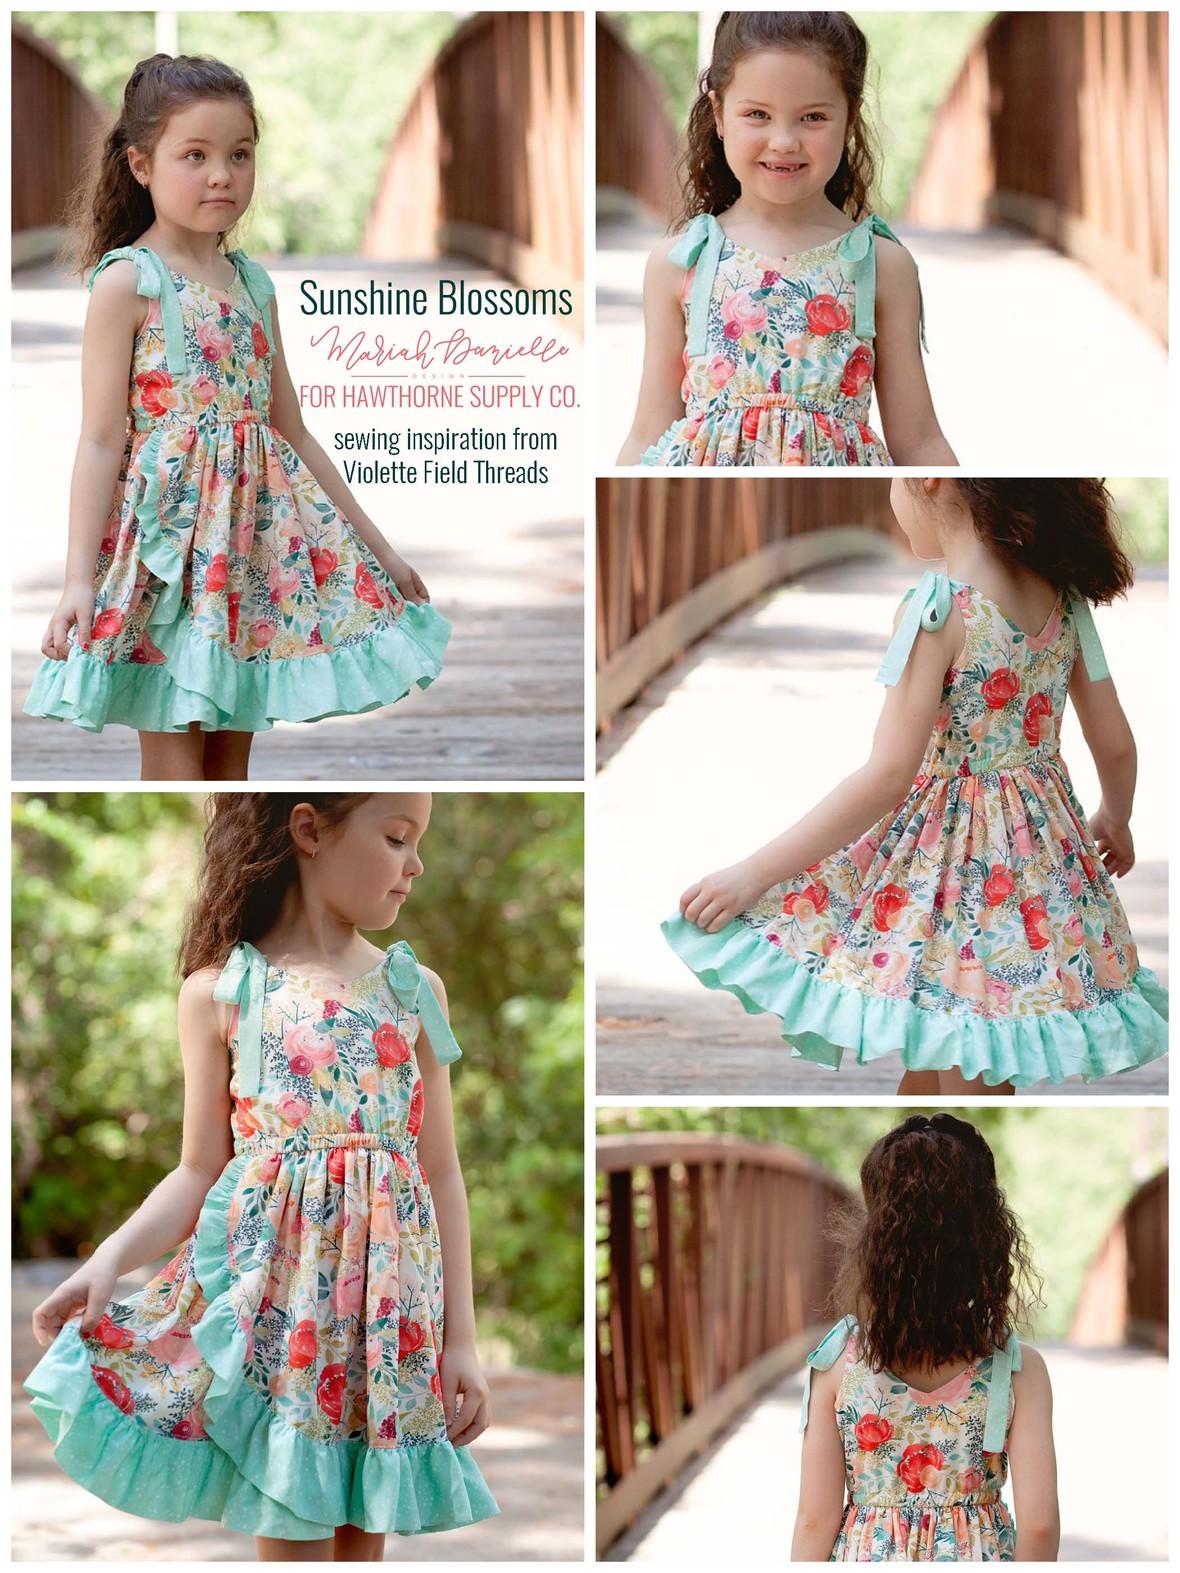 Ashley Cowan and Hawthorne Supply Co Fabric by Mariah Danielle Design